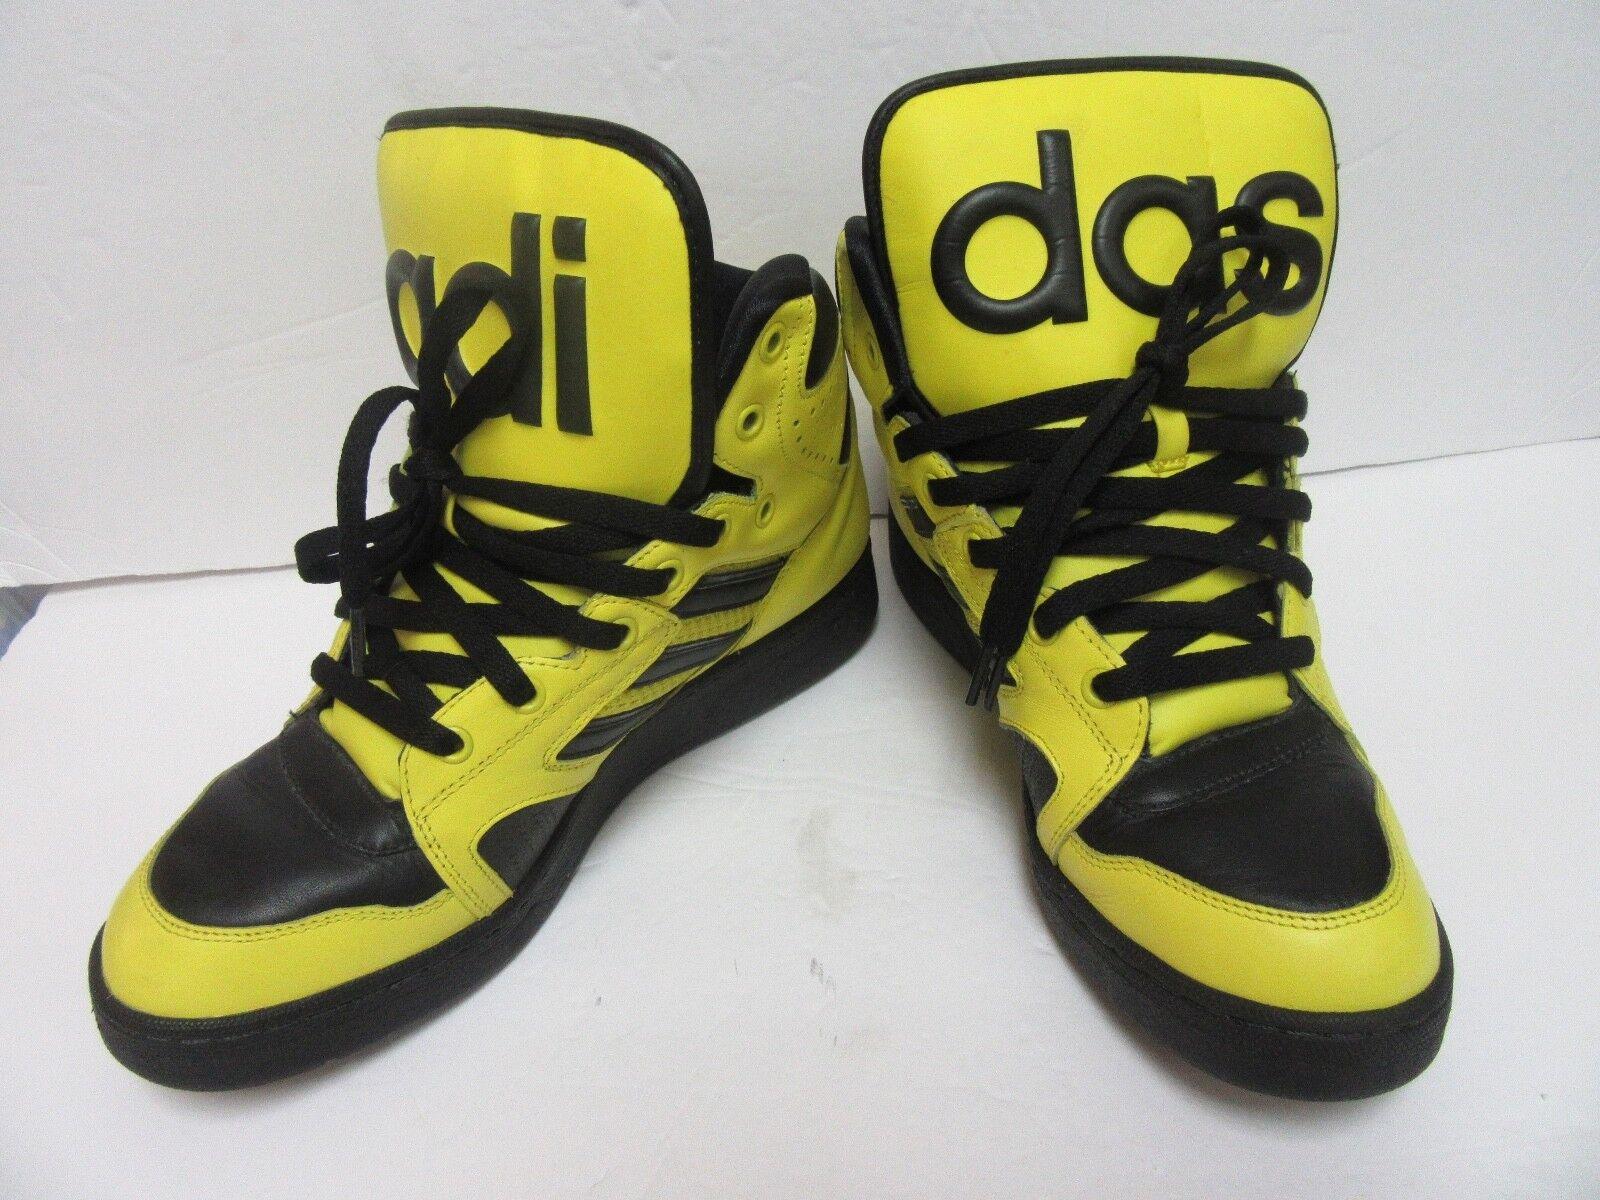 Adidas Originals zapatillas Jeremy Scott JS Instinct Hi zapatos TOP JS Scott obyo v24530 reducción de precio ec004e